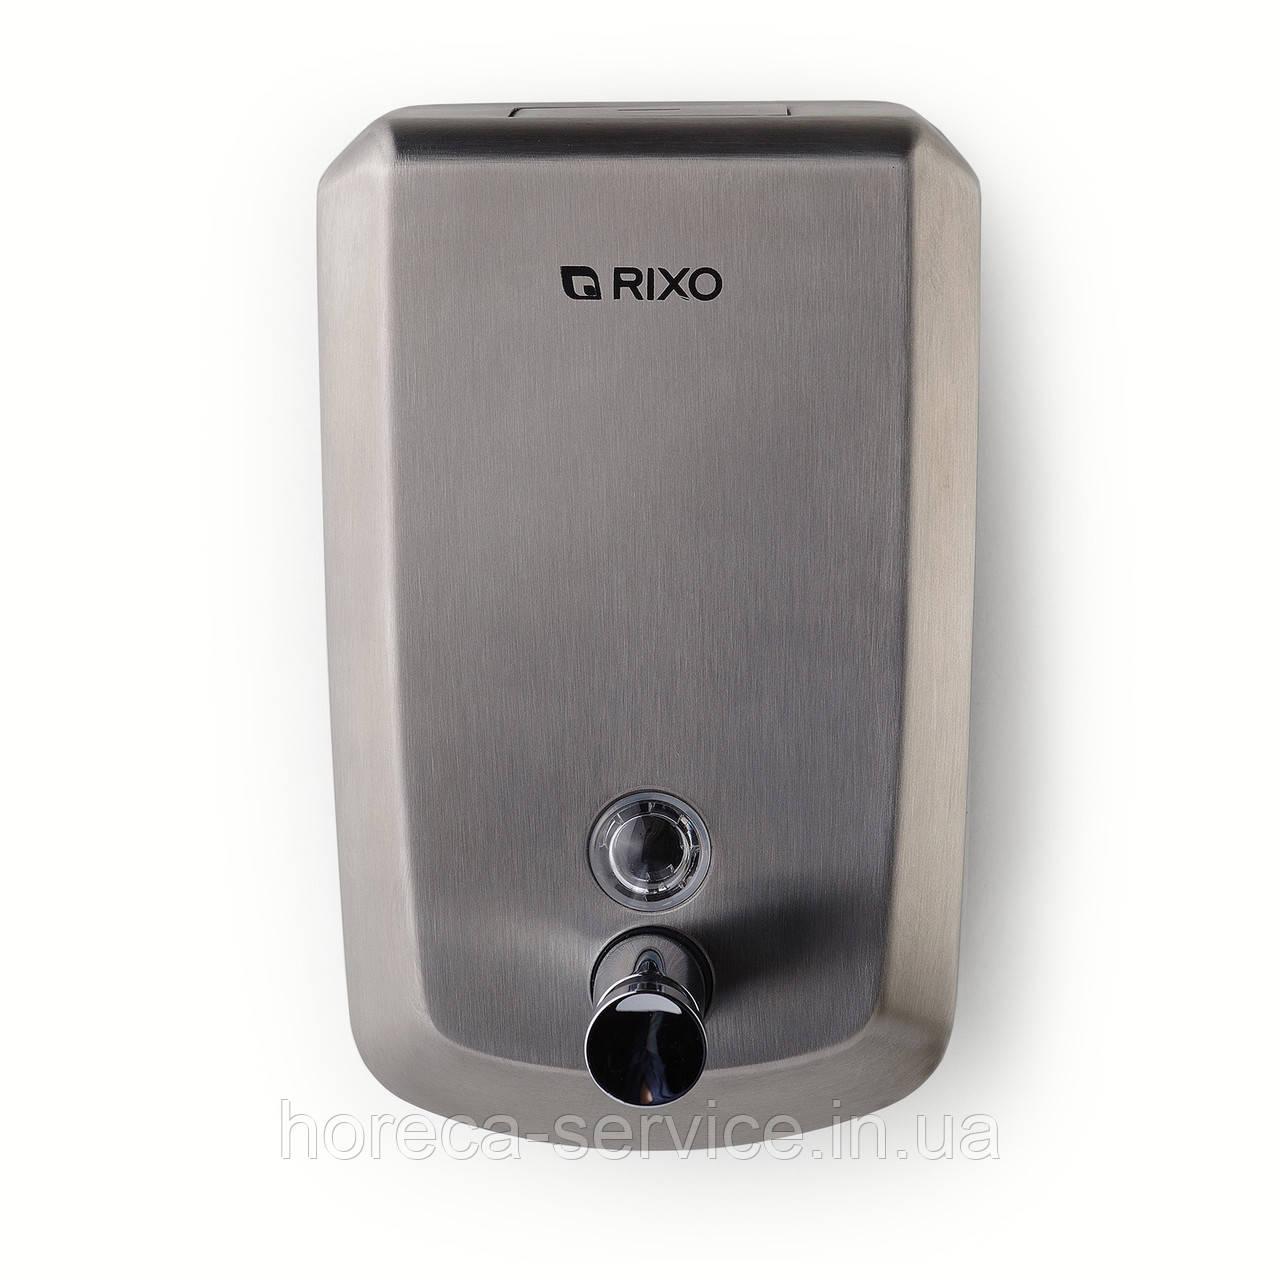 Дозатор рідкого мила Rixo Solido S001 нержавіюча сталь